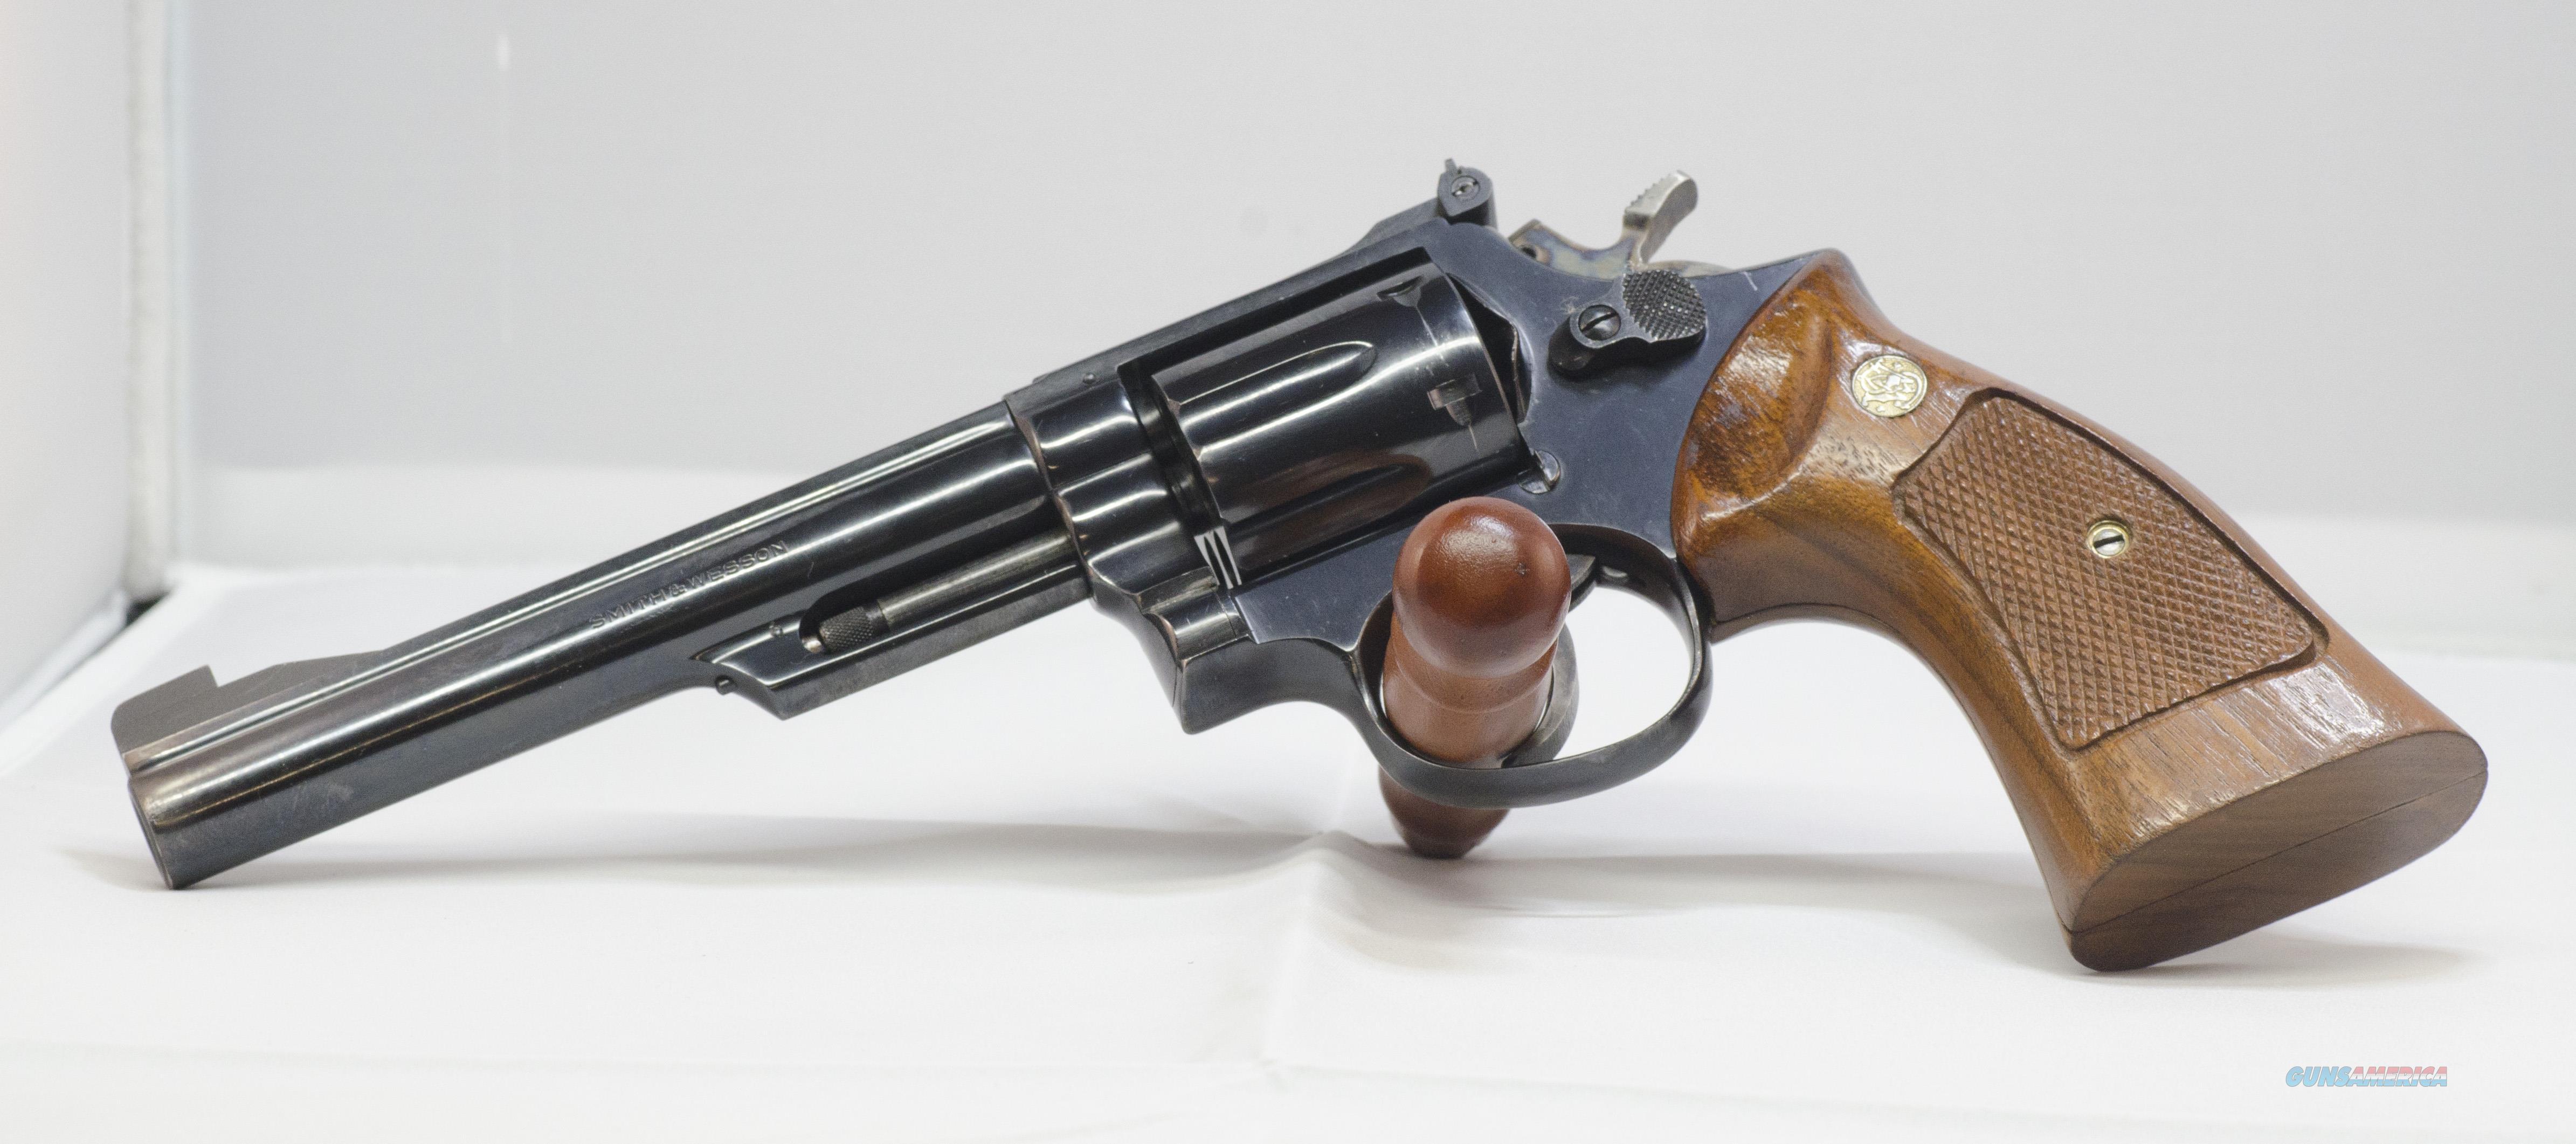 S&W .357 Mag Revolver Model 19-3 6 in bbl  Guns > Pistols > Smith & Wesson Revolvers > Med. Frame ( K/L )